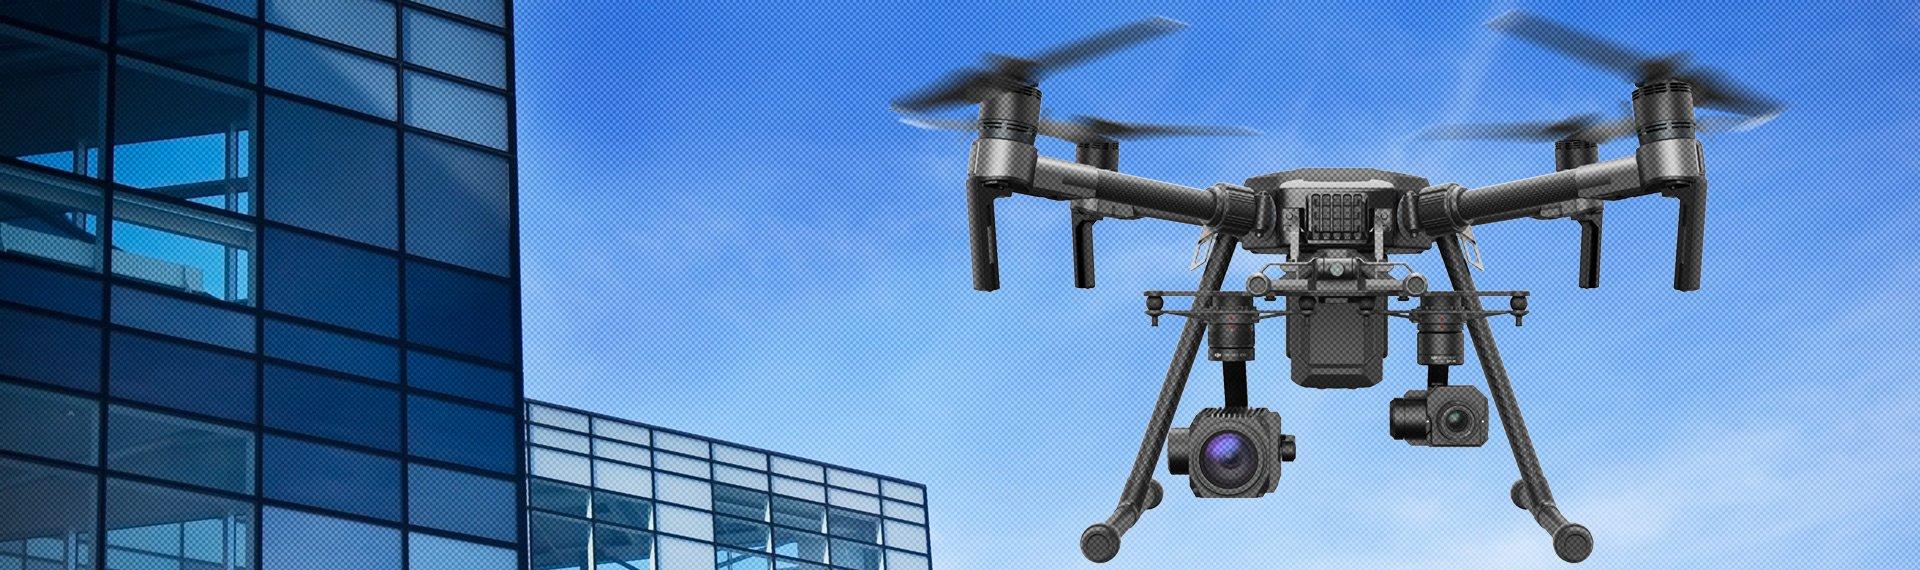 Steel City Drones Flight Academy - Slider Background